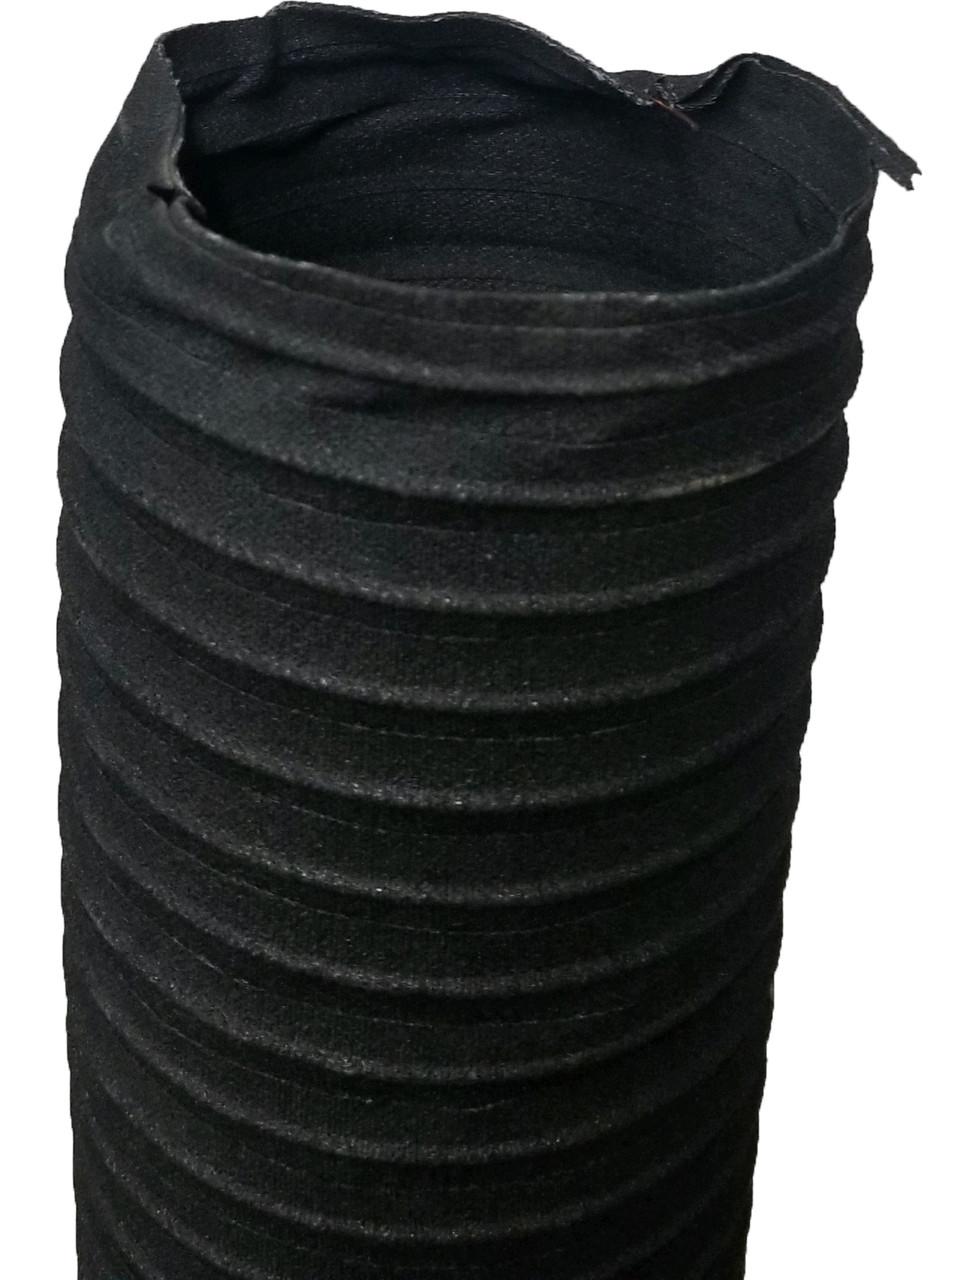 "1964-72 Cloth Dash Vent Hose, 6' x 3' 1/4"" (ea)"